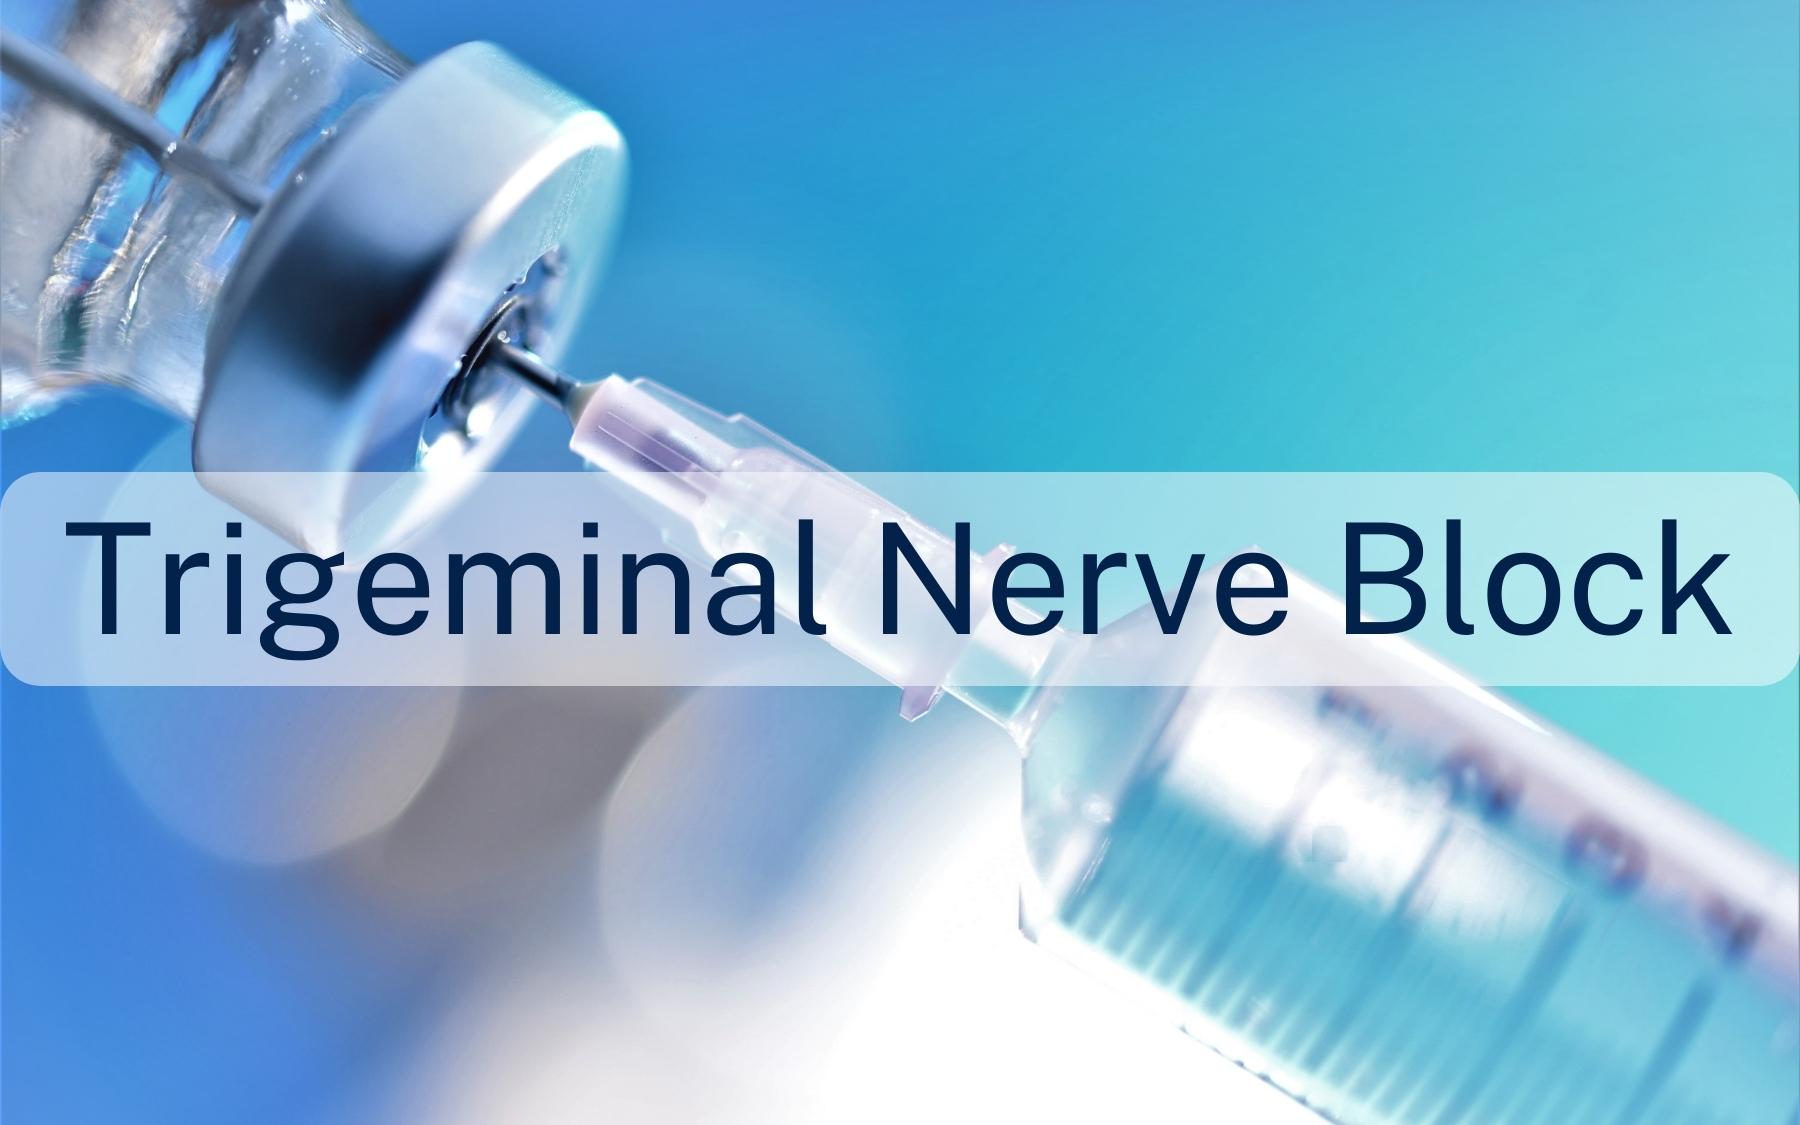 Trigeminal nerve block